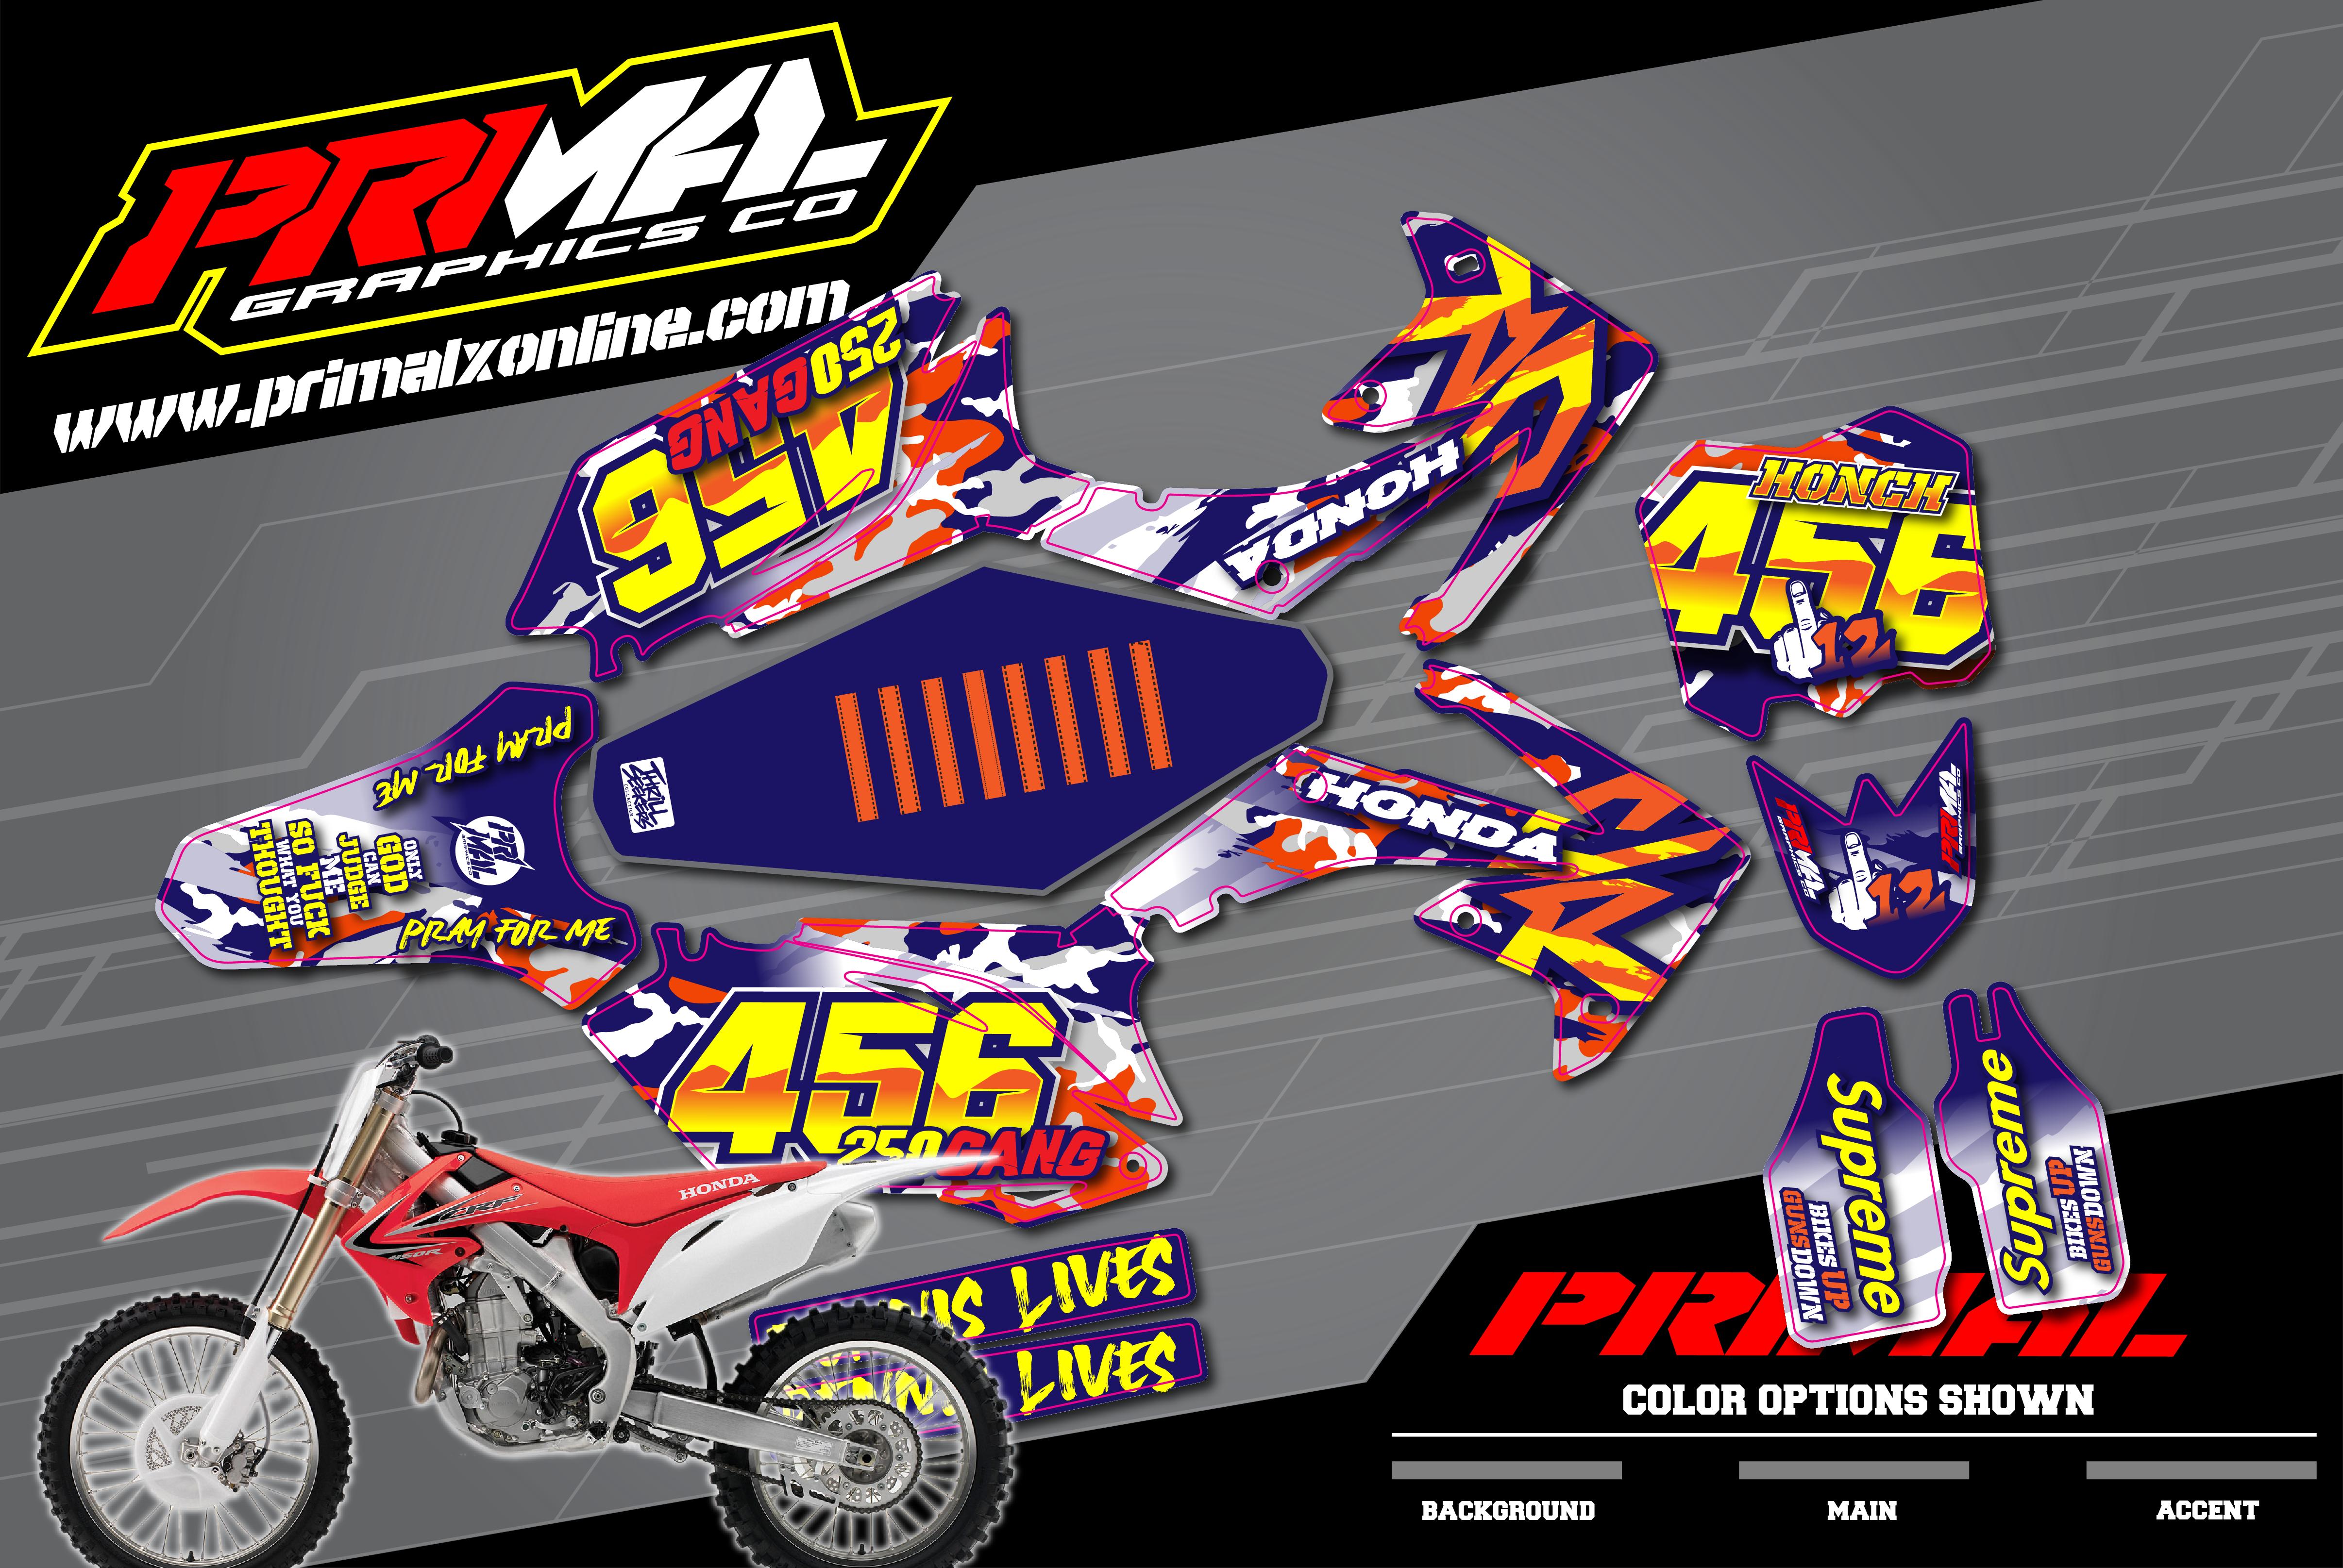 PRIMAL-X-MOTORSPORTS-PRIMAL-GRAPHICS-CO-HONDA-CRF450R-MX-GRAPHICS-MOTOCROSS-SUPERMOTO-MOTOCROSS-GRAPHICS-BIKELIFE-01-01